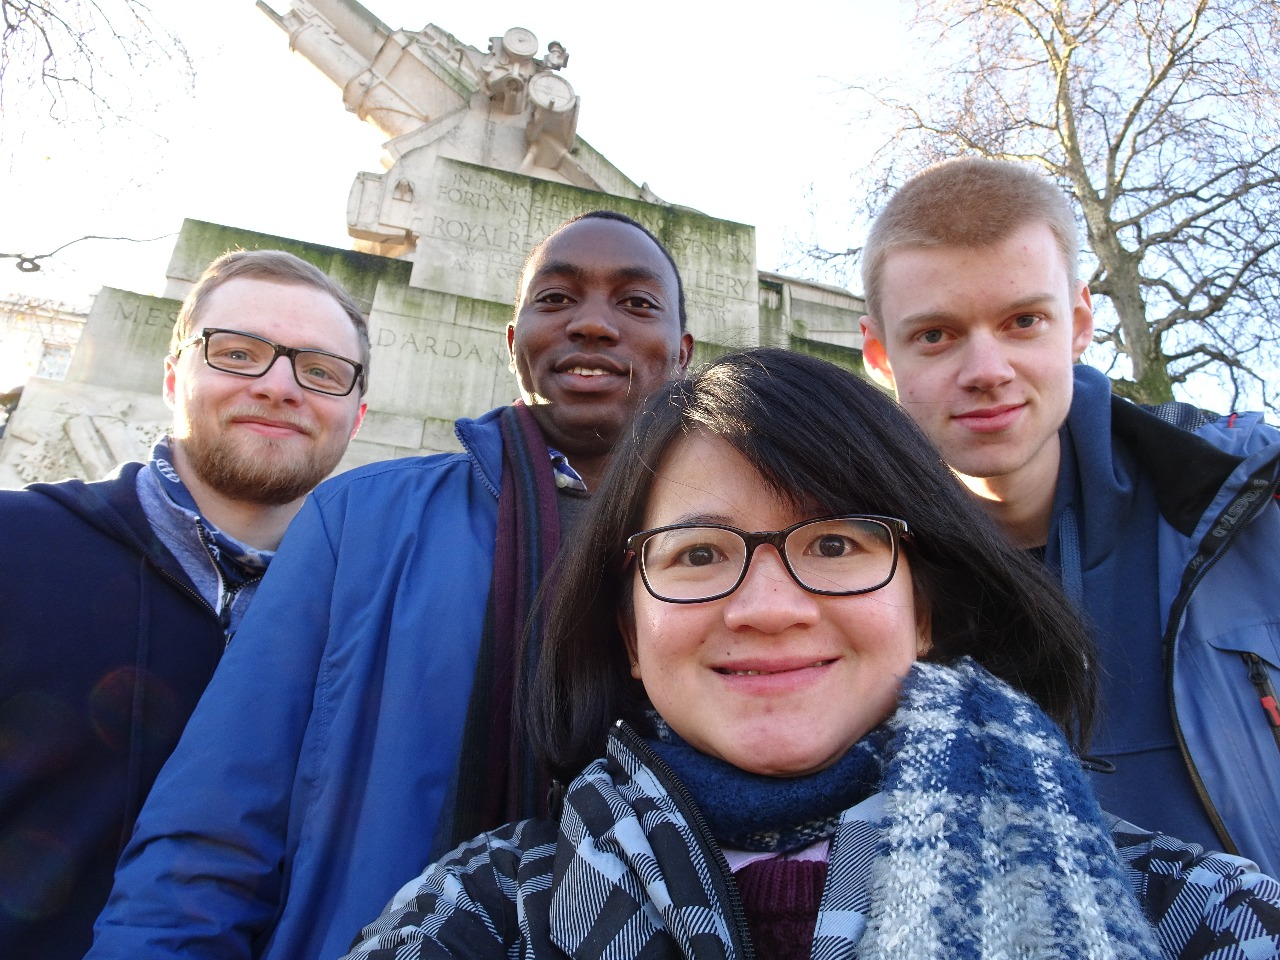 Left to right : Brendan (USA), Urbanus (Kenya), Bella (Indonesia), Joseph (Norway)